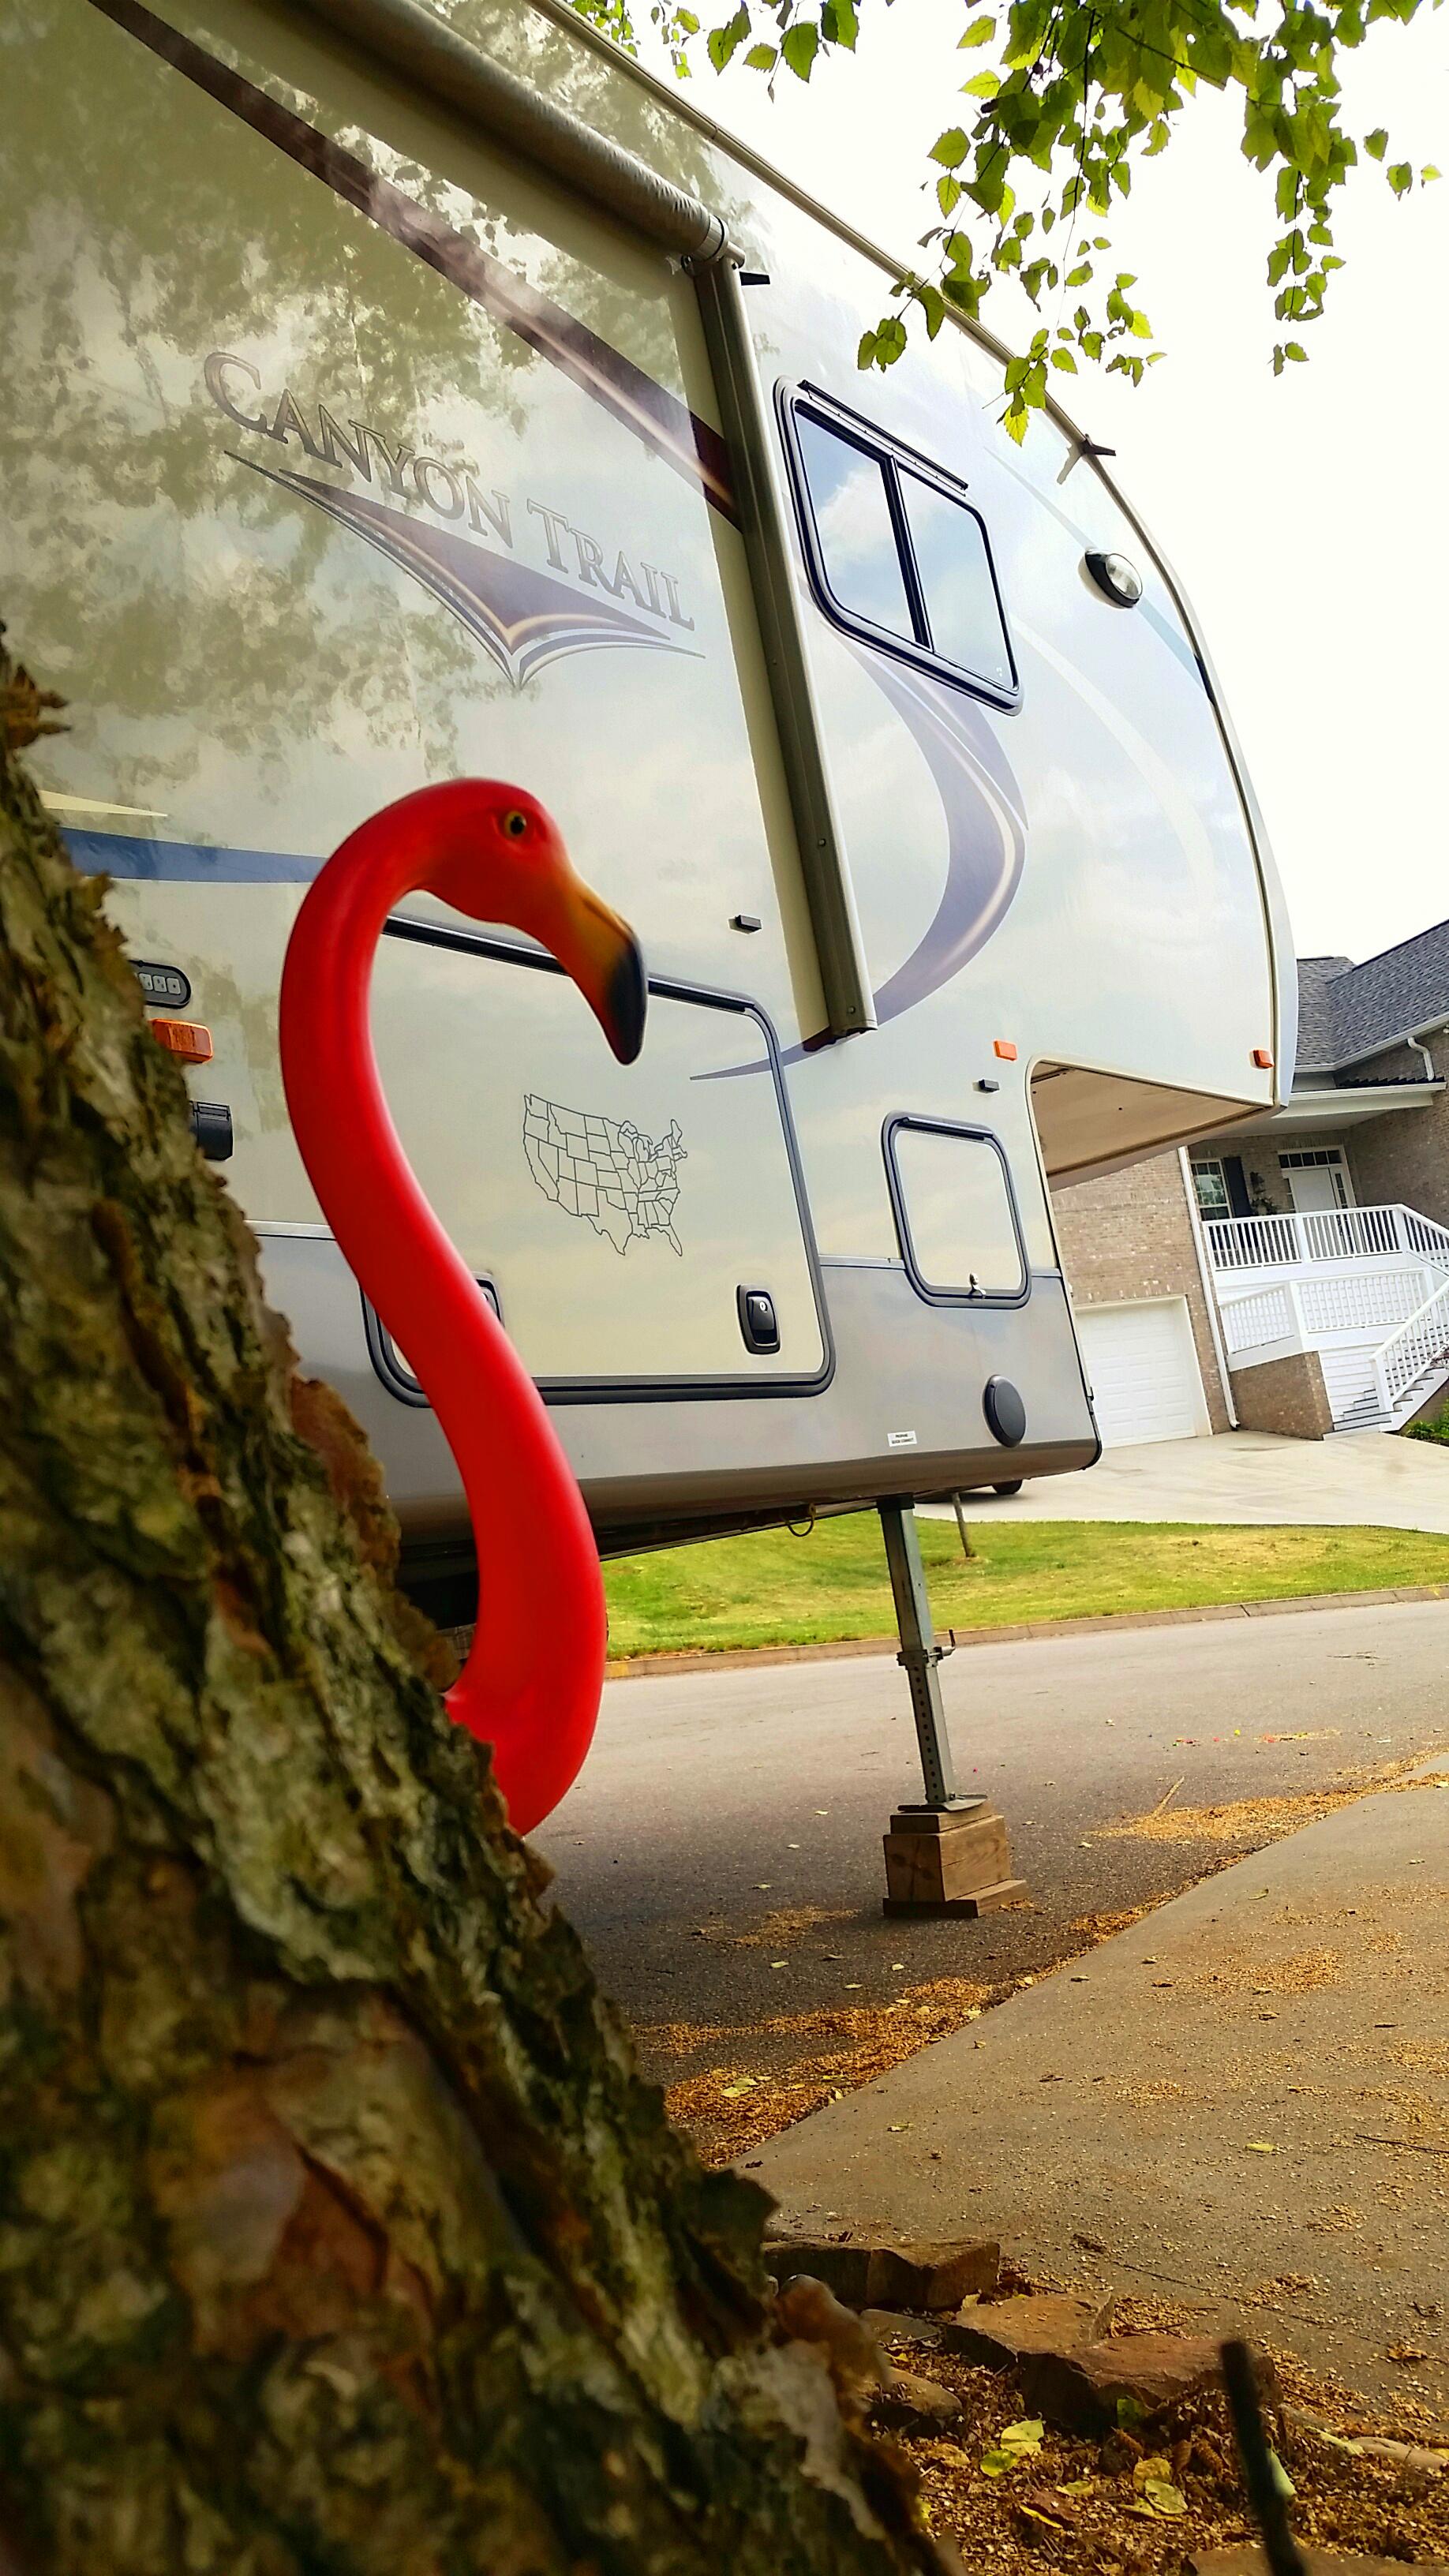 wpid-rv-flamingo-from-dropbox.jpeg